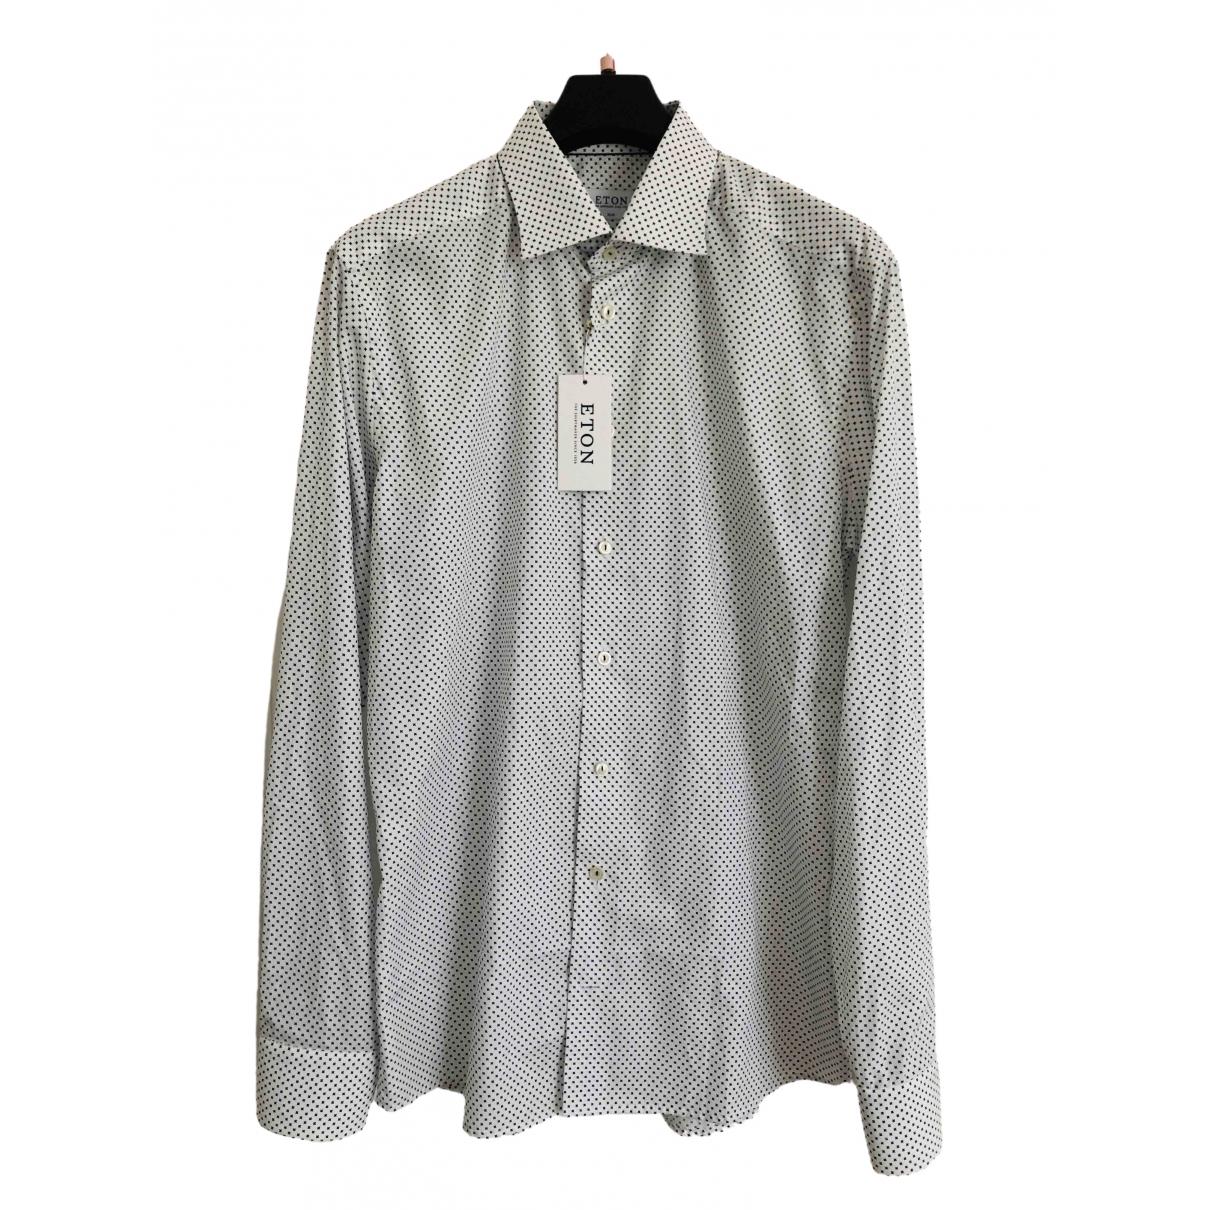 Camisas Non Signe / Unsigned